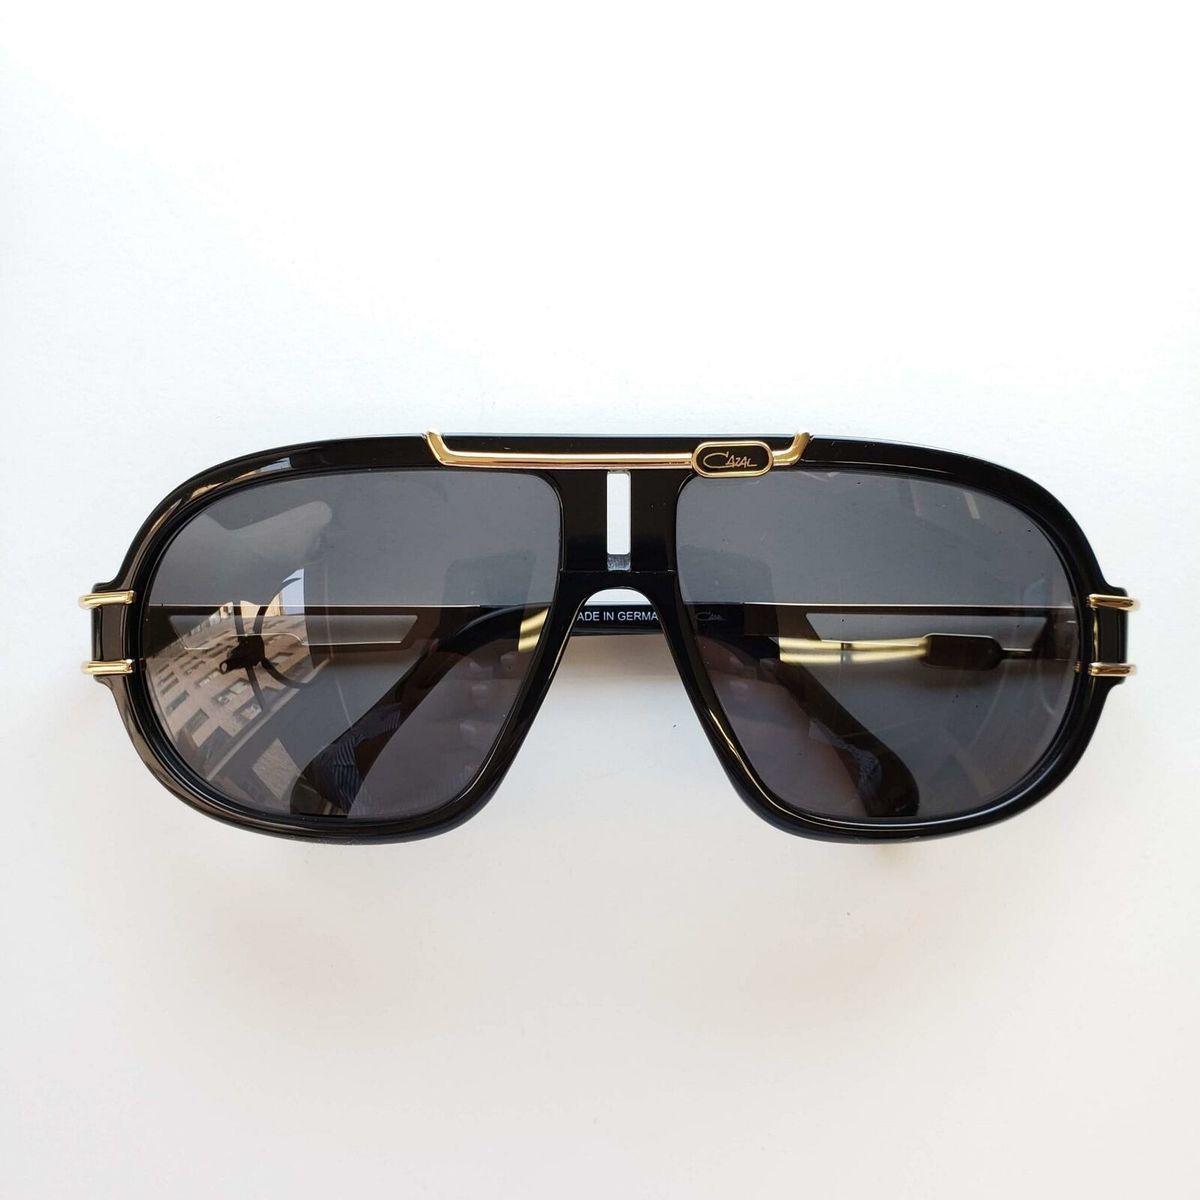 Cazal カザール メン ズオーバーサイズ サングラス Sunglasses 8018 001 Gradient Lens 64mm Gold/Black